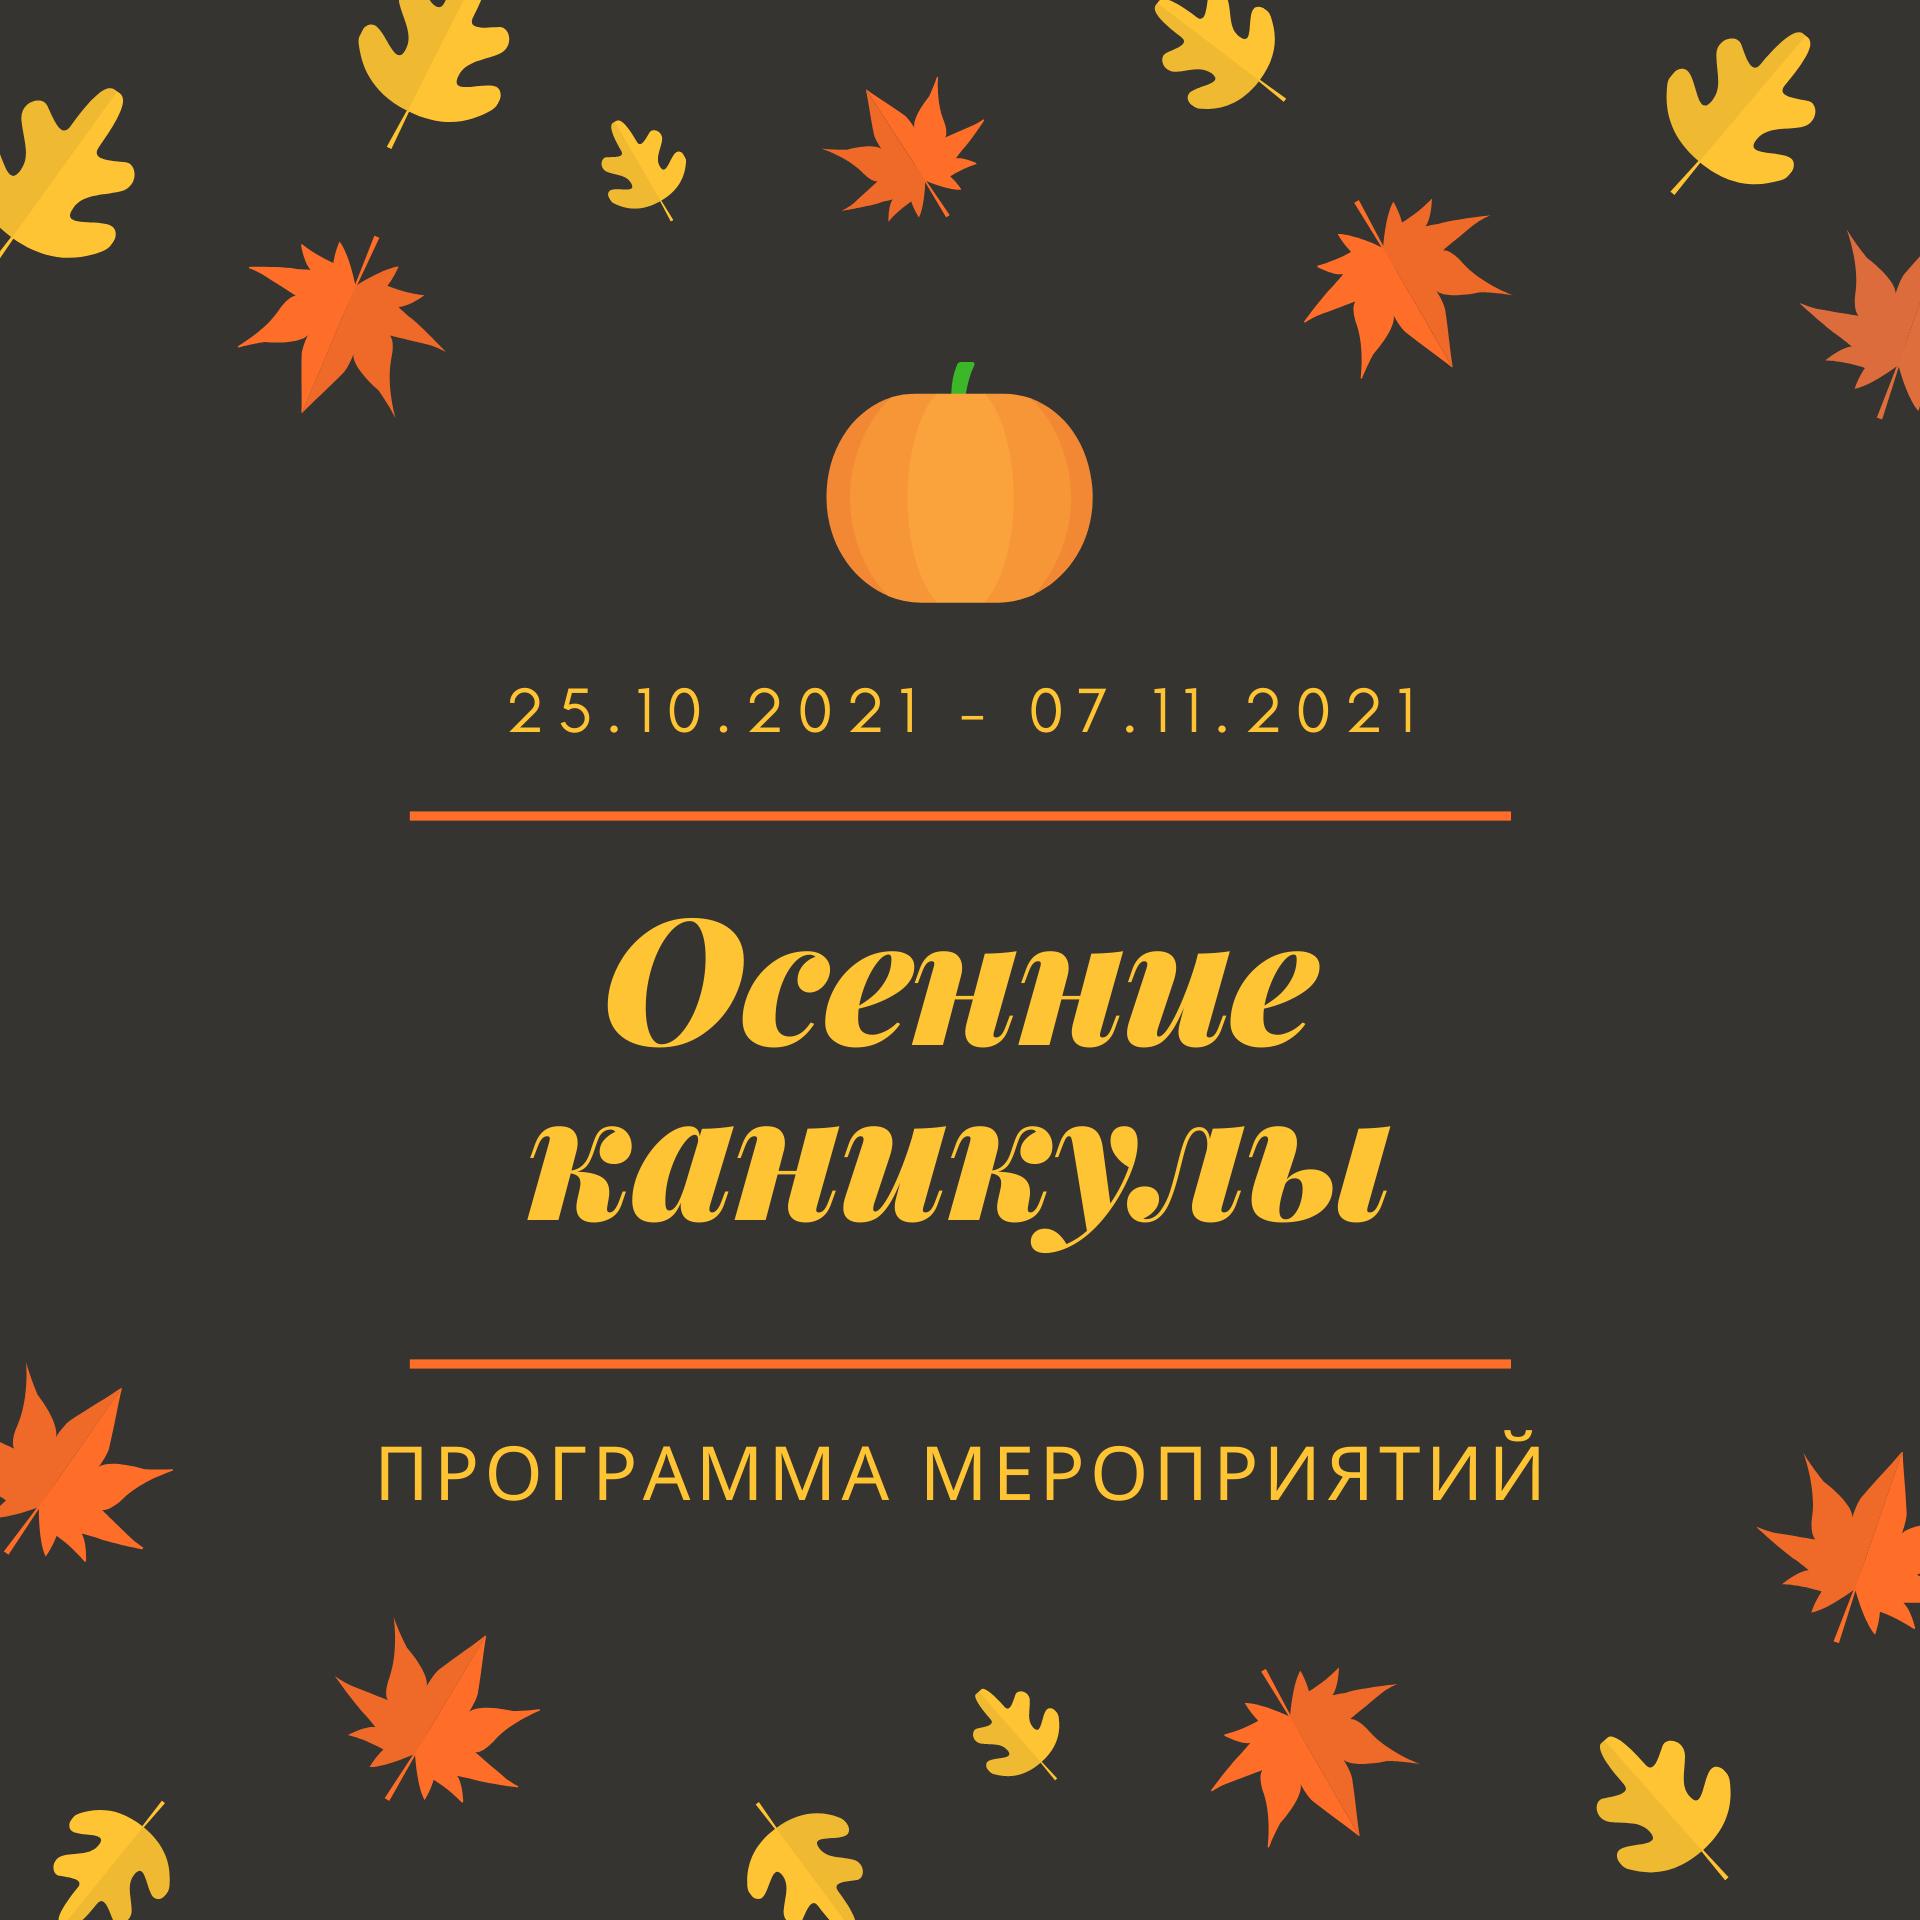 Программа мероприятий на осенние каникулы 25.10.2021 – 07.11.2021